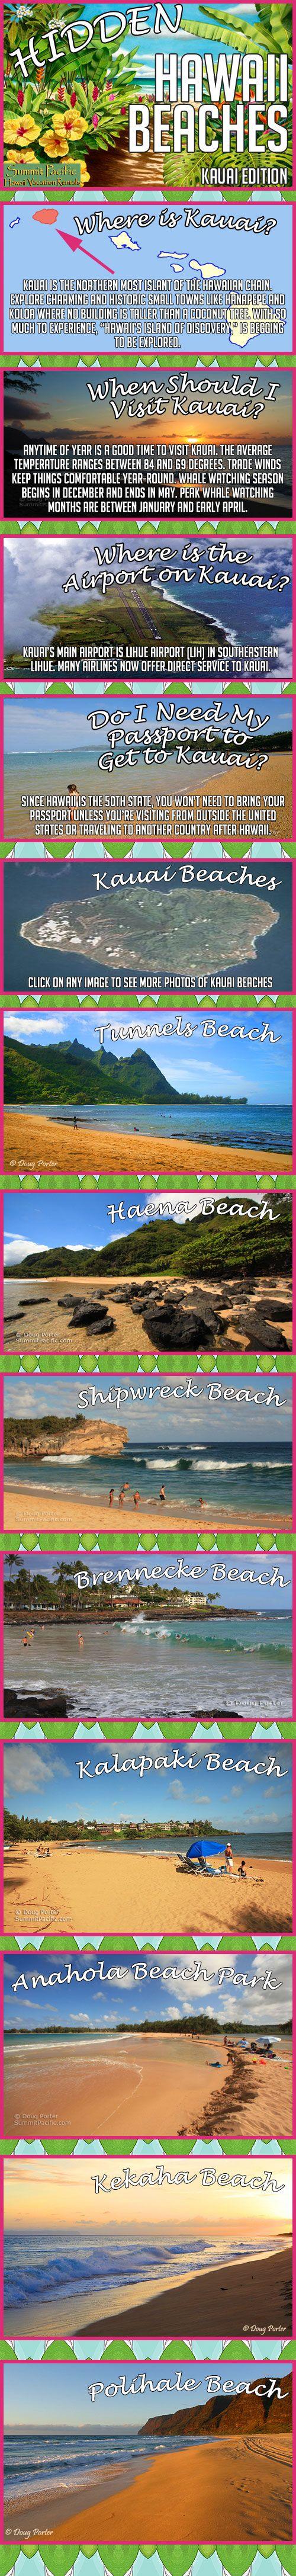 Hidden Hawaii Beaches - Kauai Edition - www.SummitPacific.com